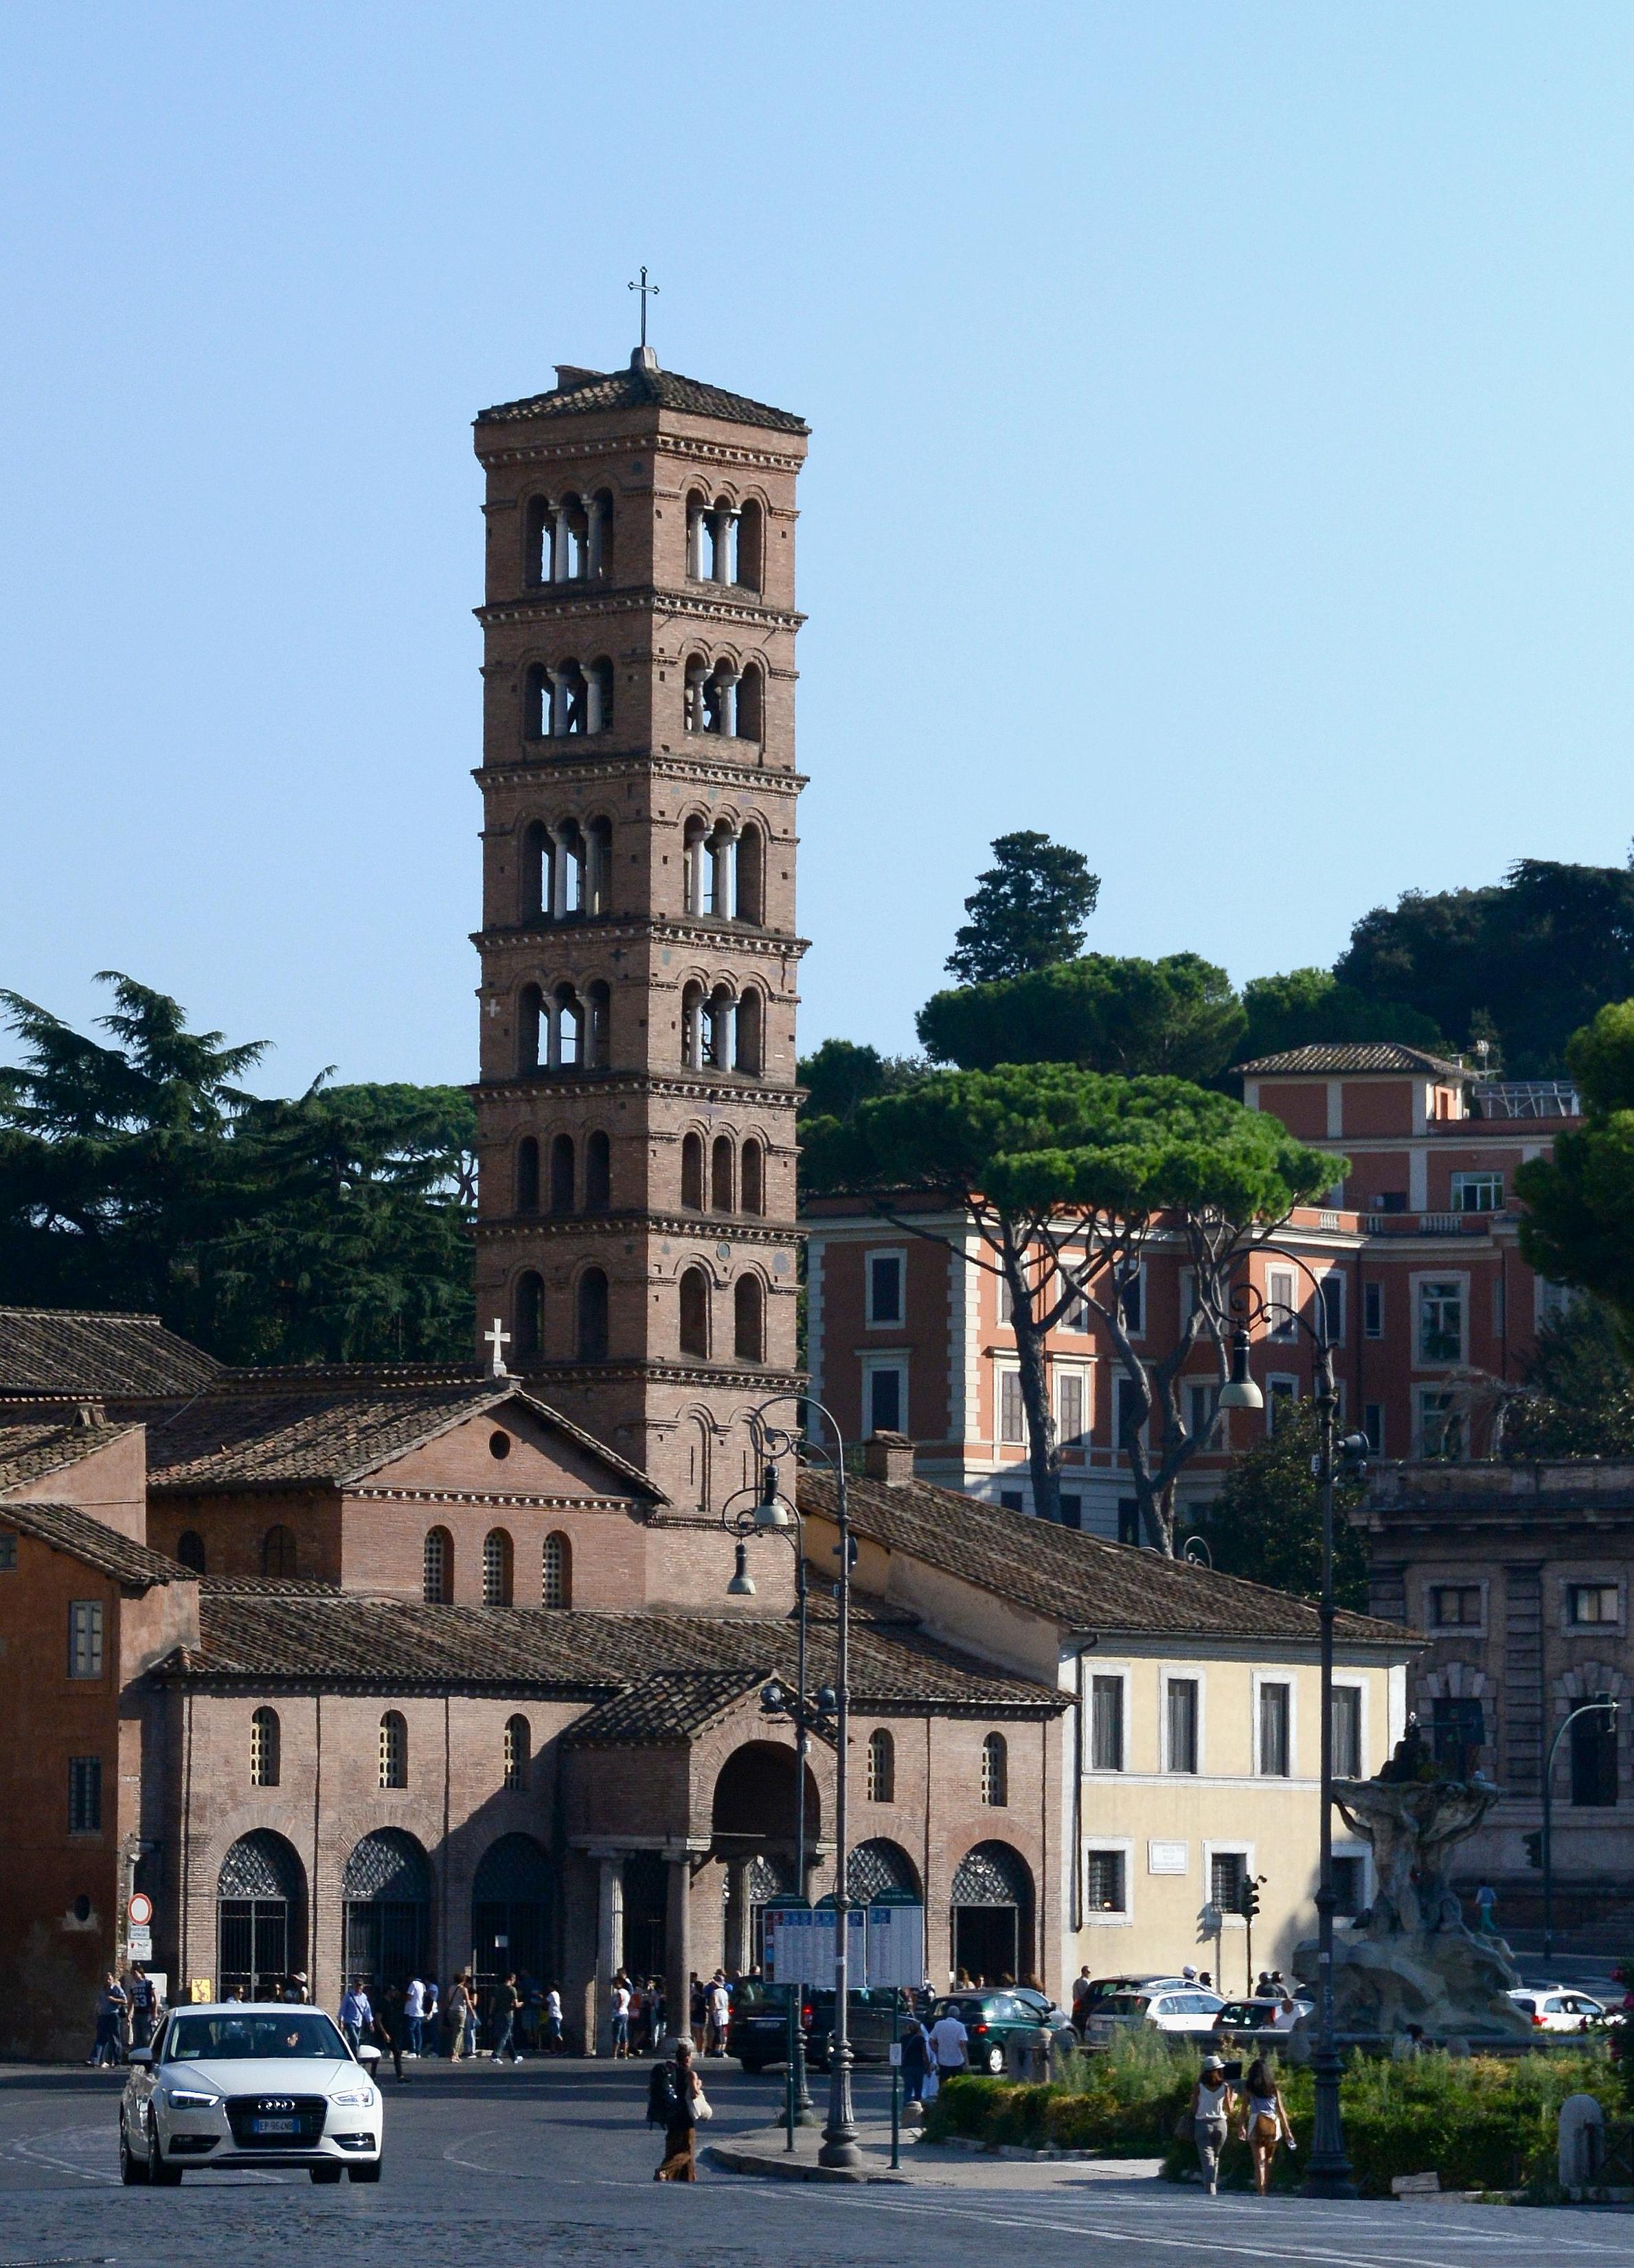 Santa Maria in Cosmedin in Rome off-the-beaten path